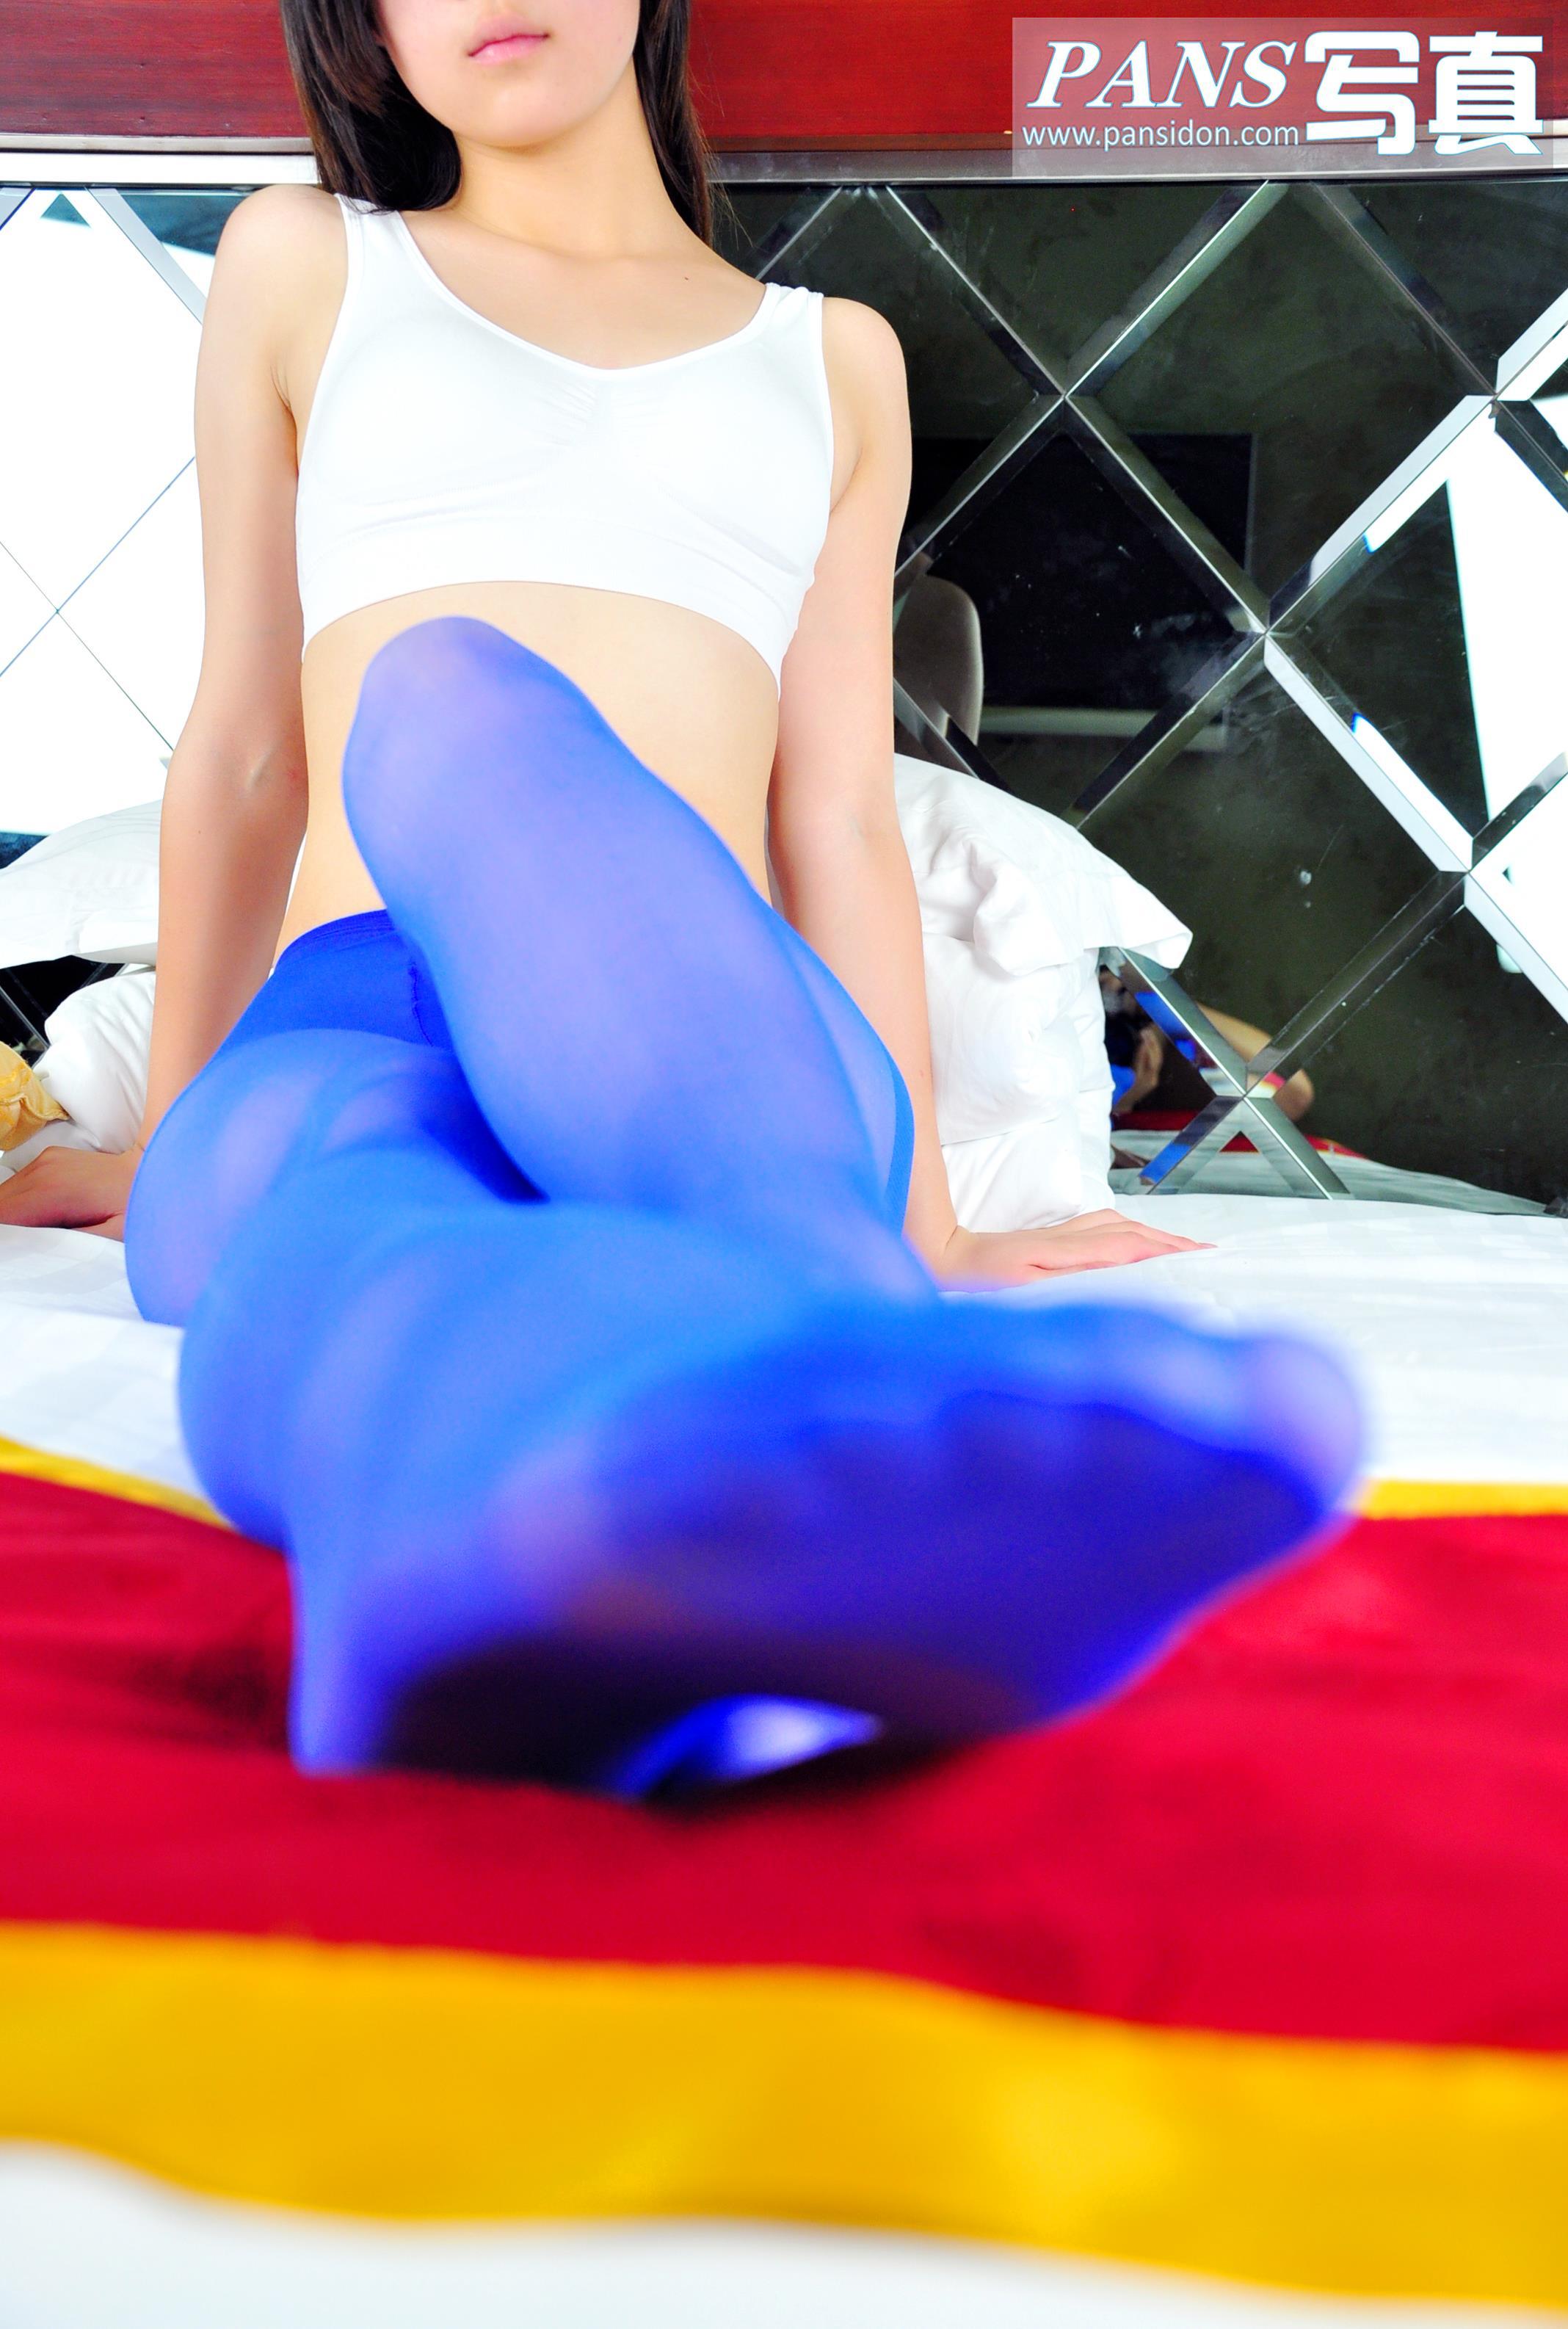 [PANS盘丝洞写真]NO.087期 白色性感内衣小美女蓝色丝袜美腿私房写真集